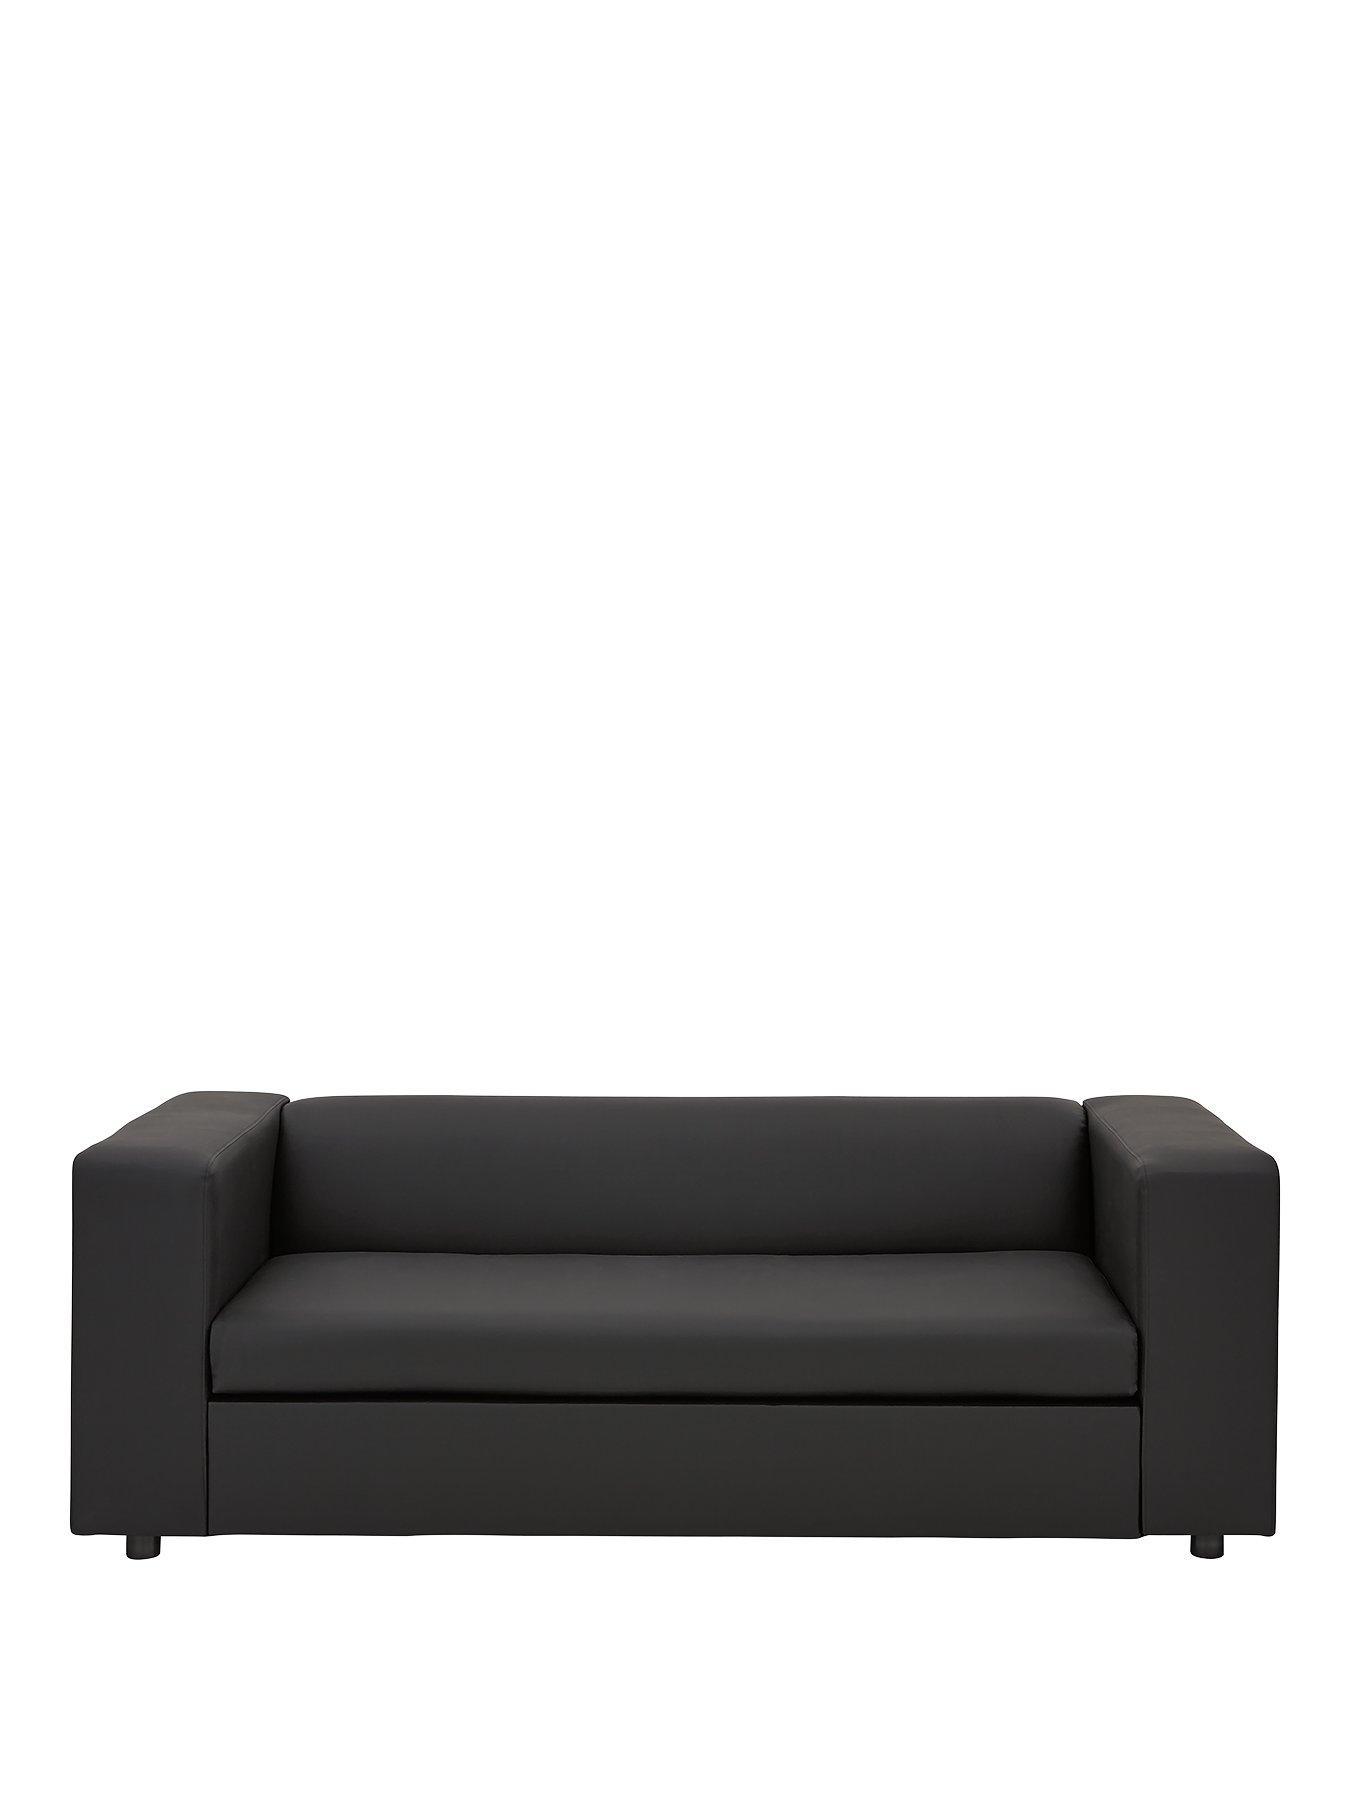 faux leather sofa bed uk kuka tamara grey fabric chaise clarke very co